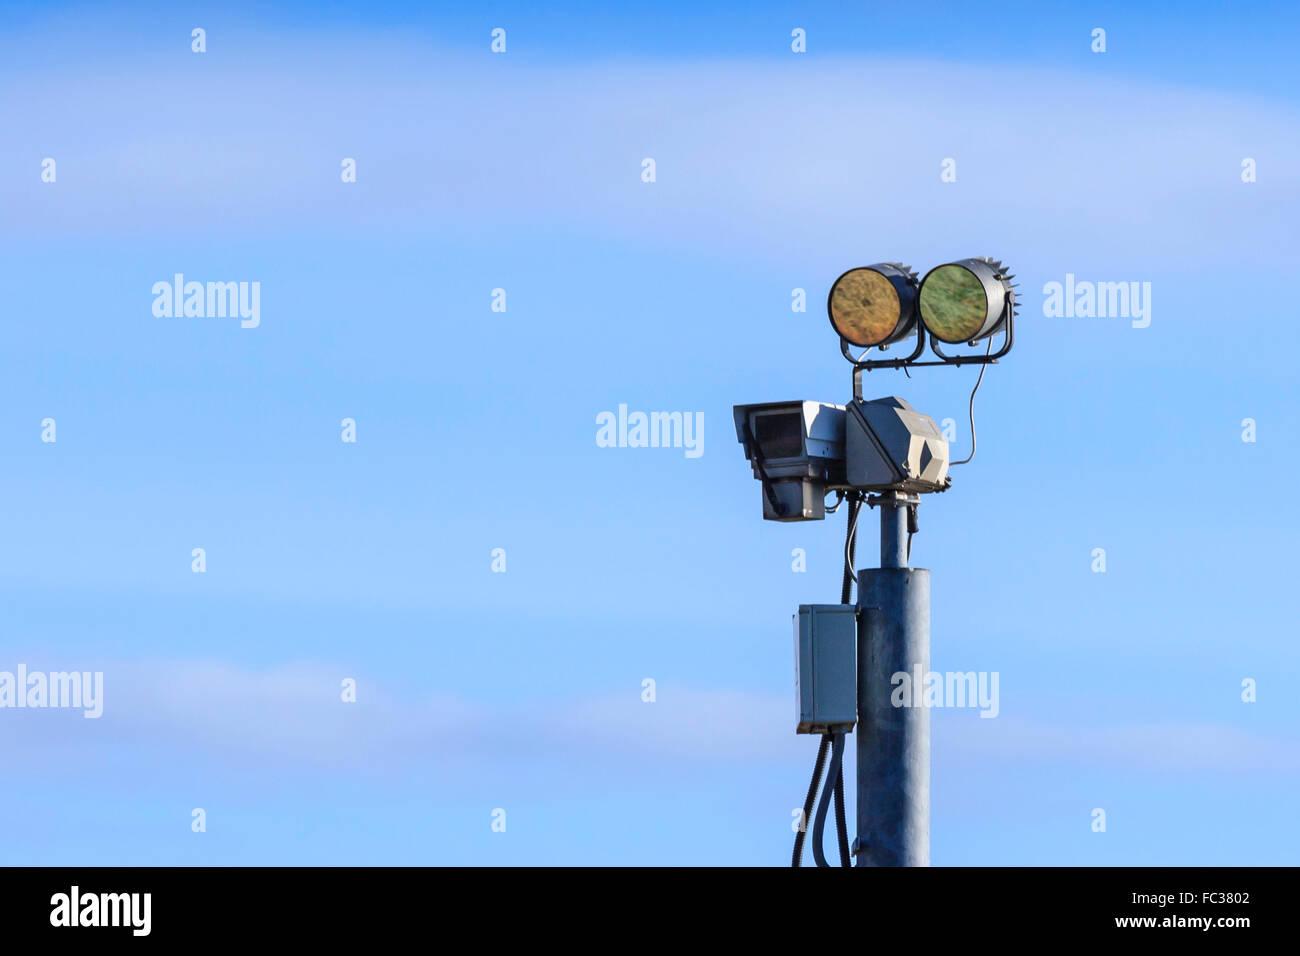 Closed-circuit television (CCTV) surveillance camera Stock Photo